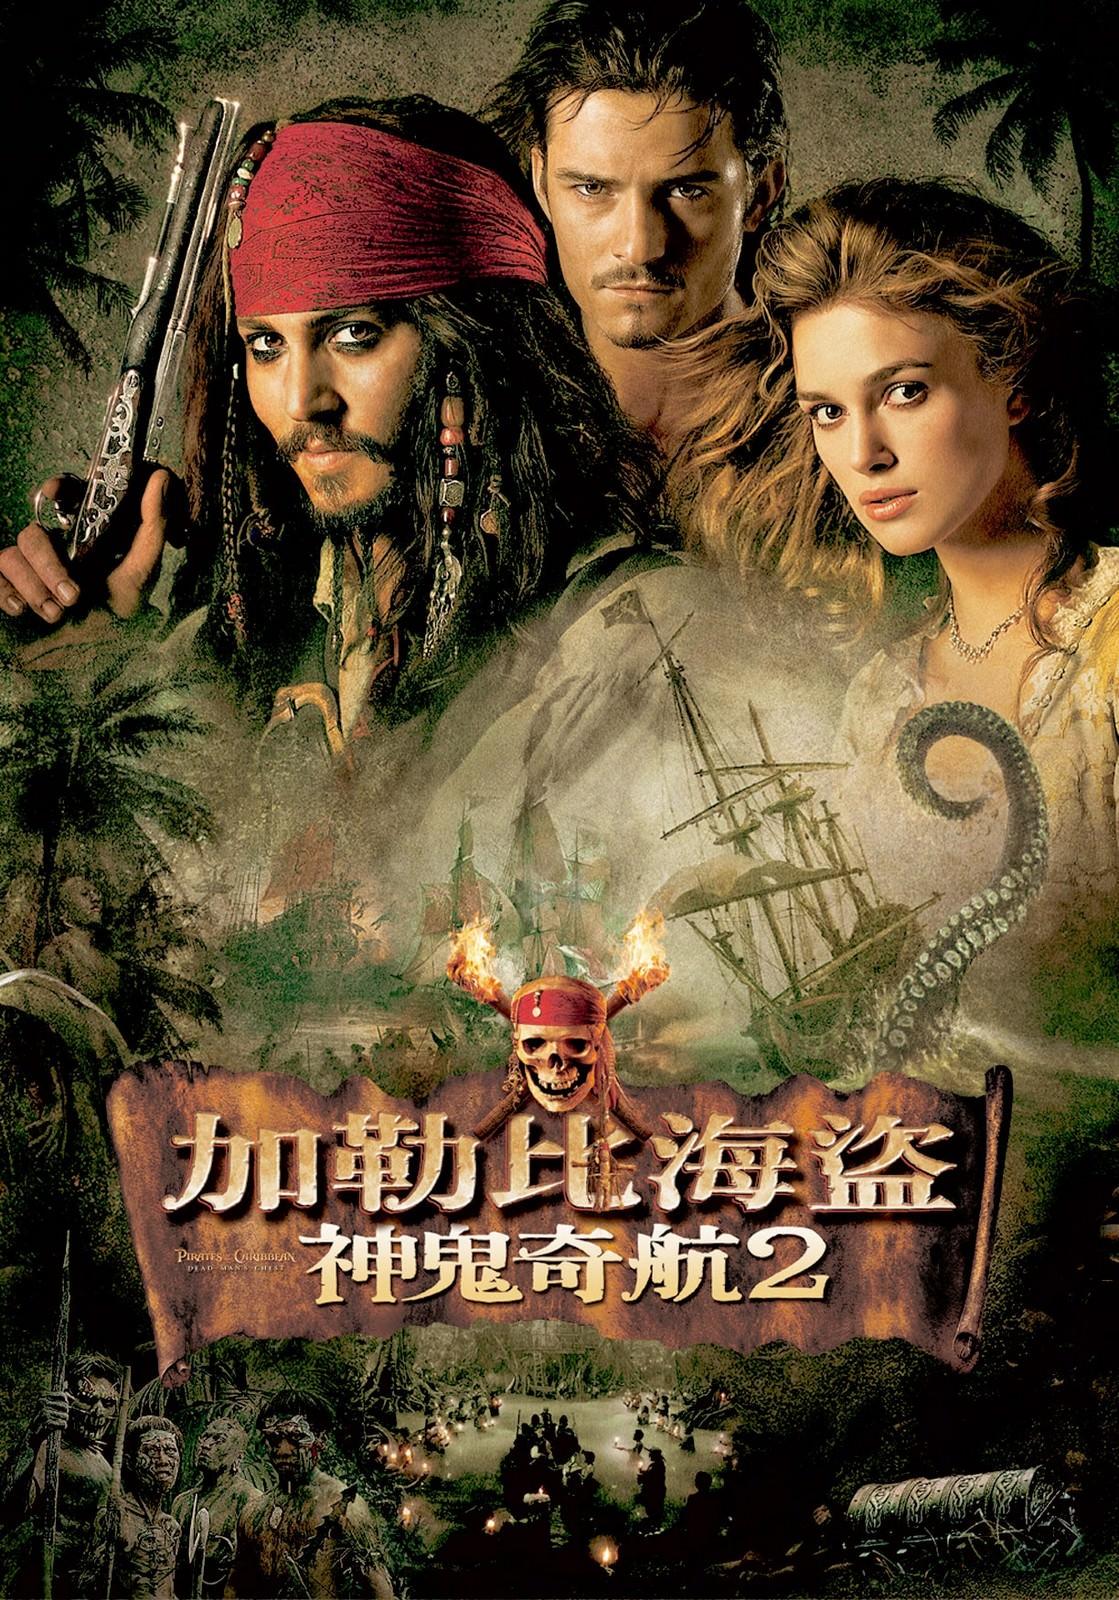 Movie, Pirates of the Caribbean: Dead Man's Chest(美國, 2006年) / 神鬼奇航2:加勒比海盜(台灣) / 加勒比海盜:決戰魔盜王(香港) / 加勒比海盗2:聚魂棺(網路), 電影DVD封面